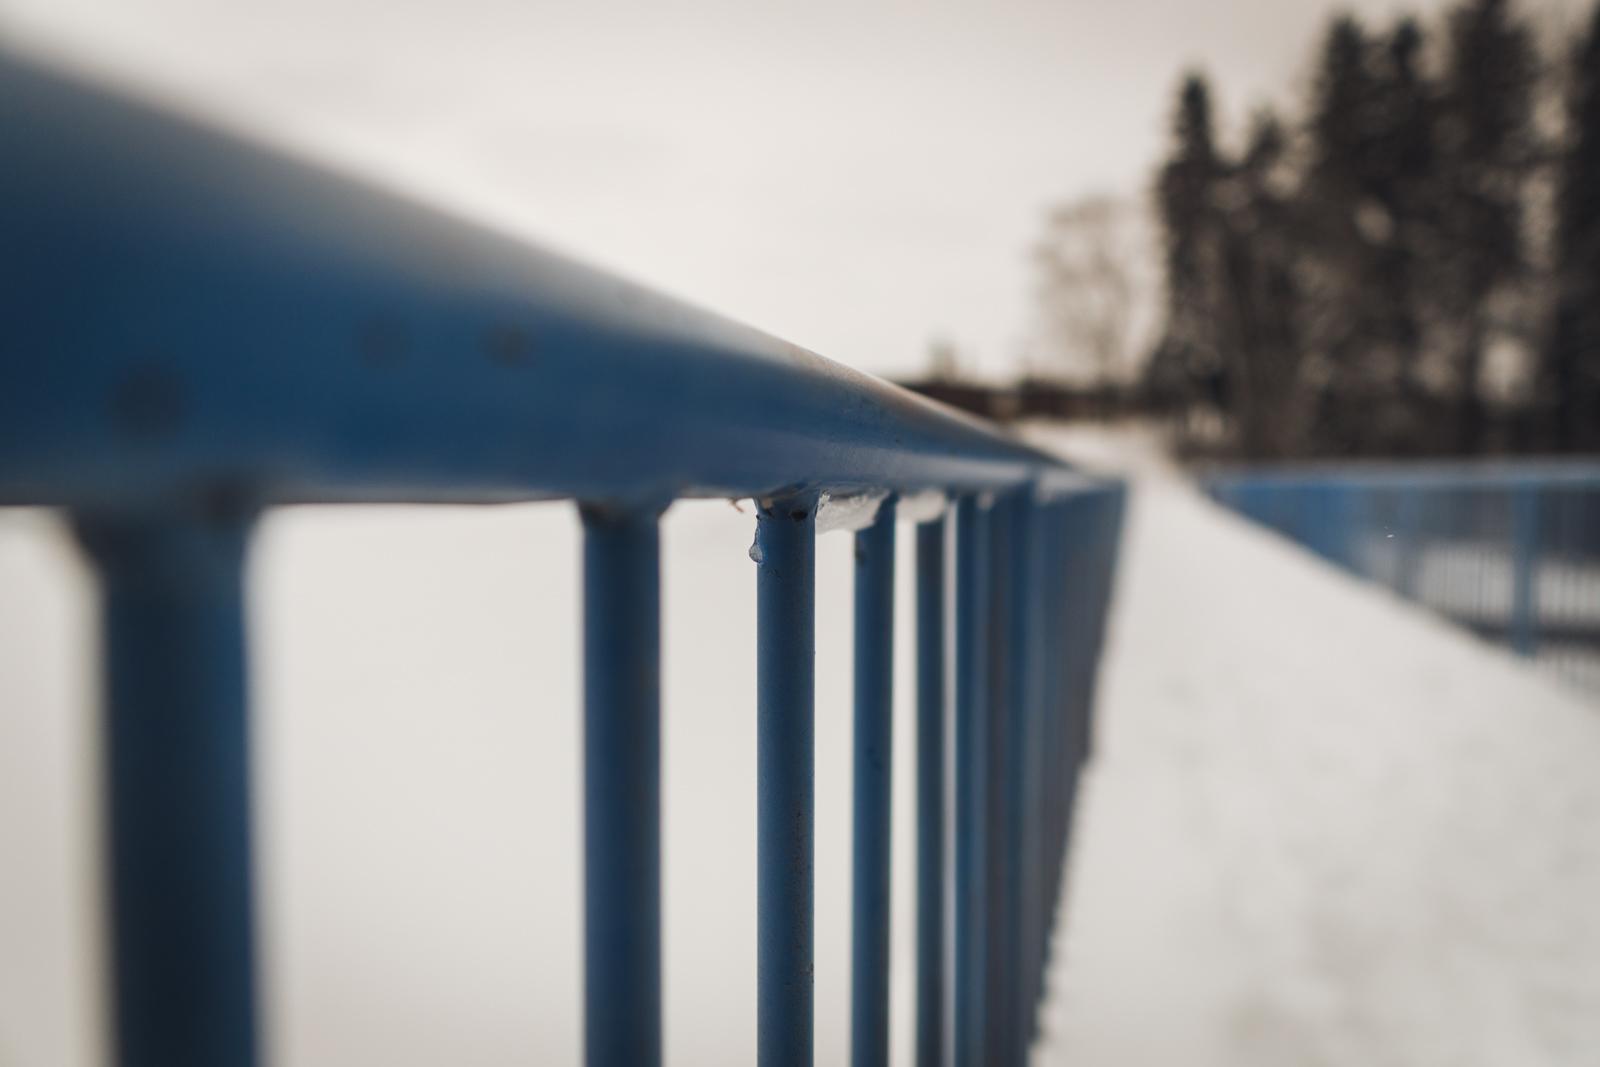 lakeheadwalk-sony-012319-blog-11.jpg